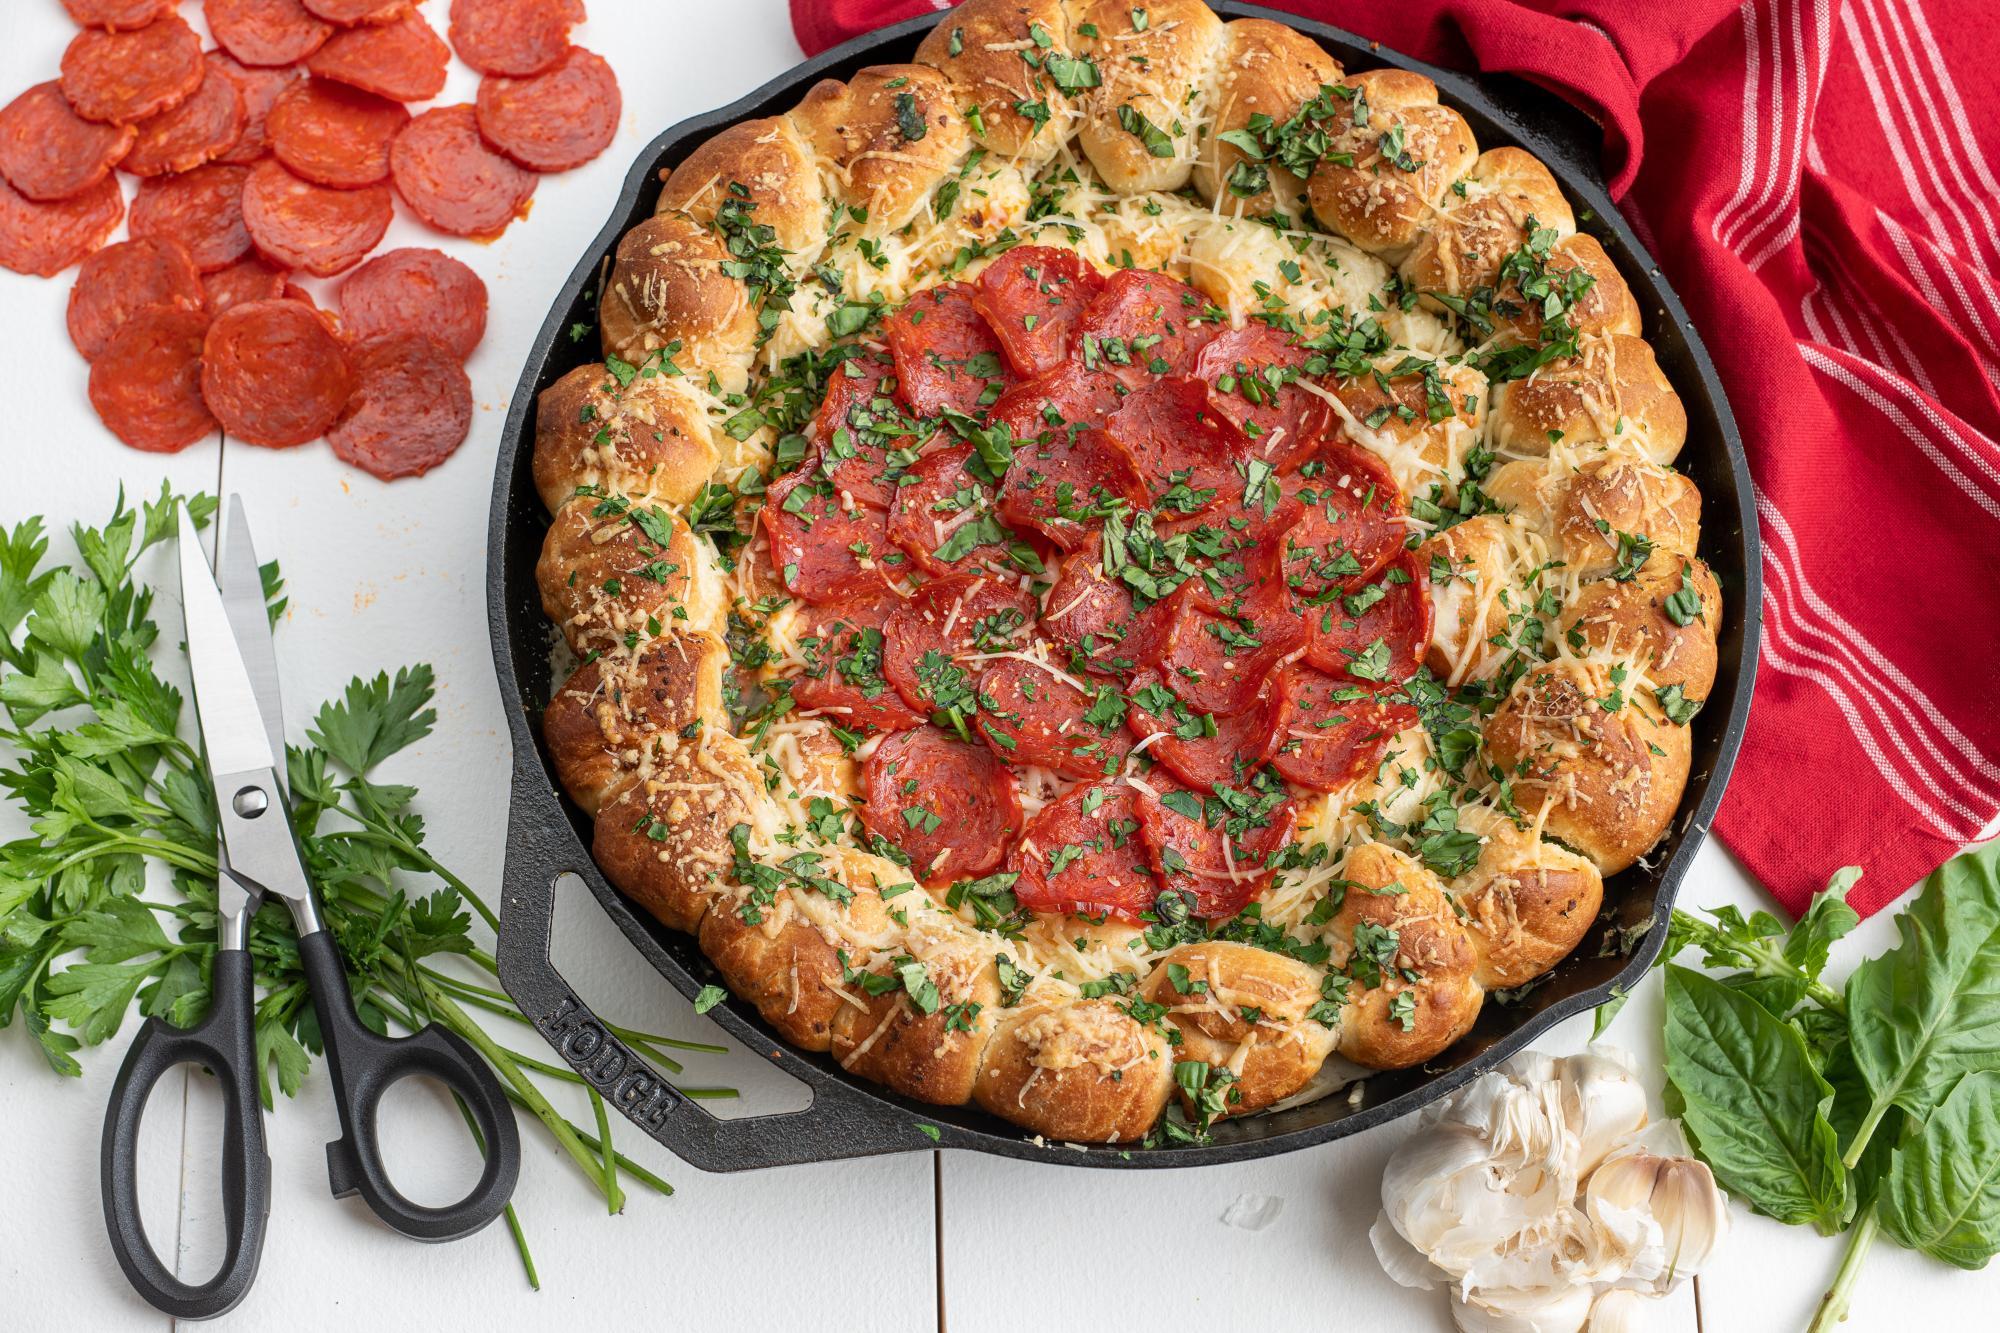 Pizza Dip Appetizer in a Skillet